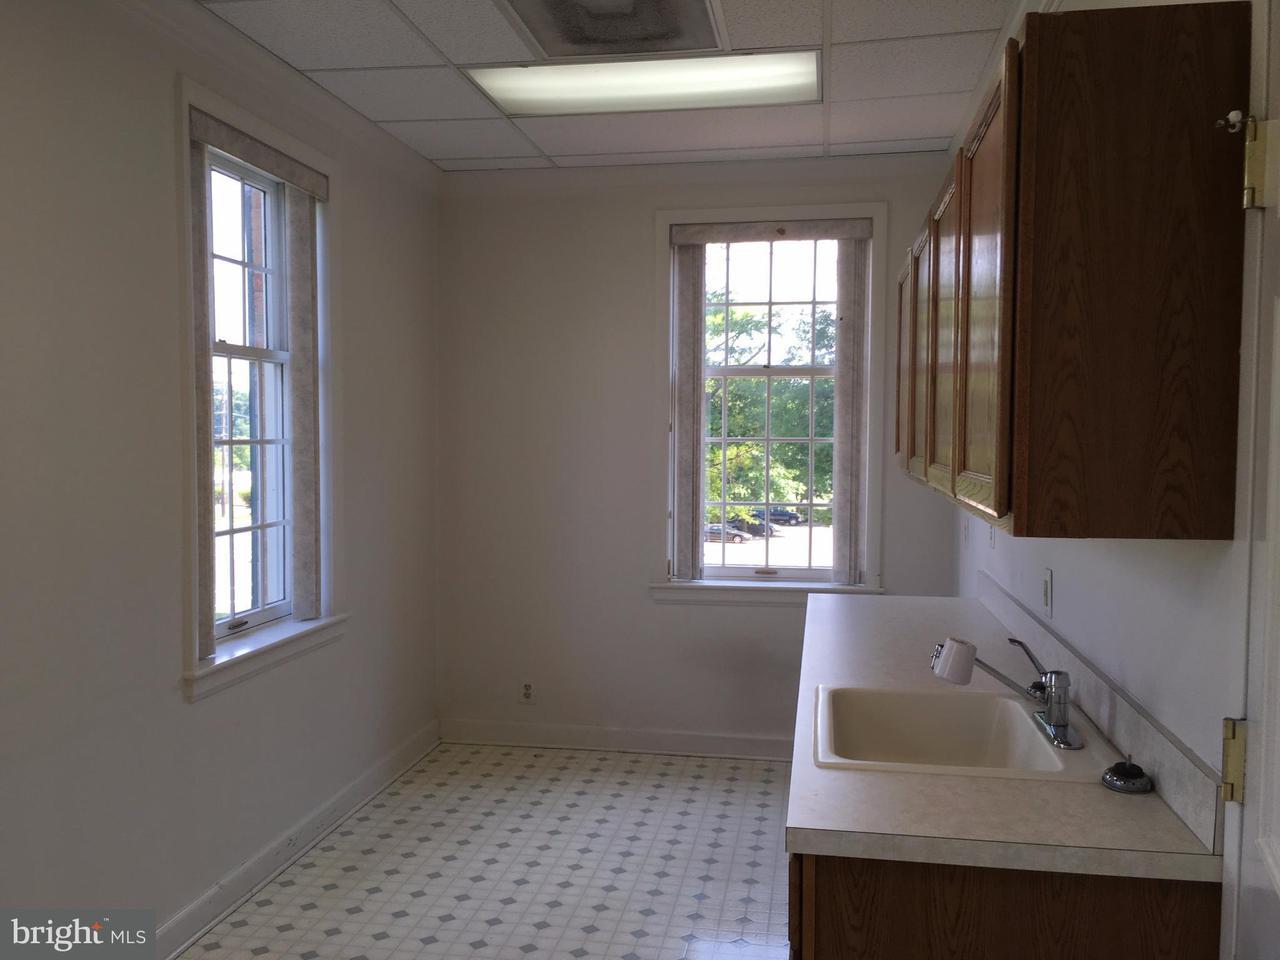 Additional photo for property listing at 550 Broadview Avenue 550 Broadview Avenue Warrenton, Virginia 20186 Stati Uniti